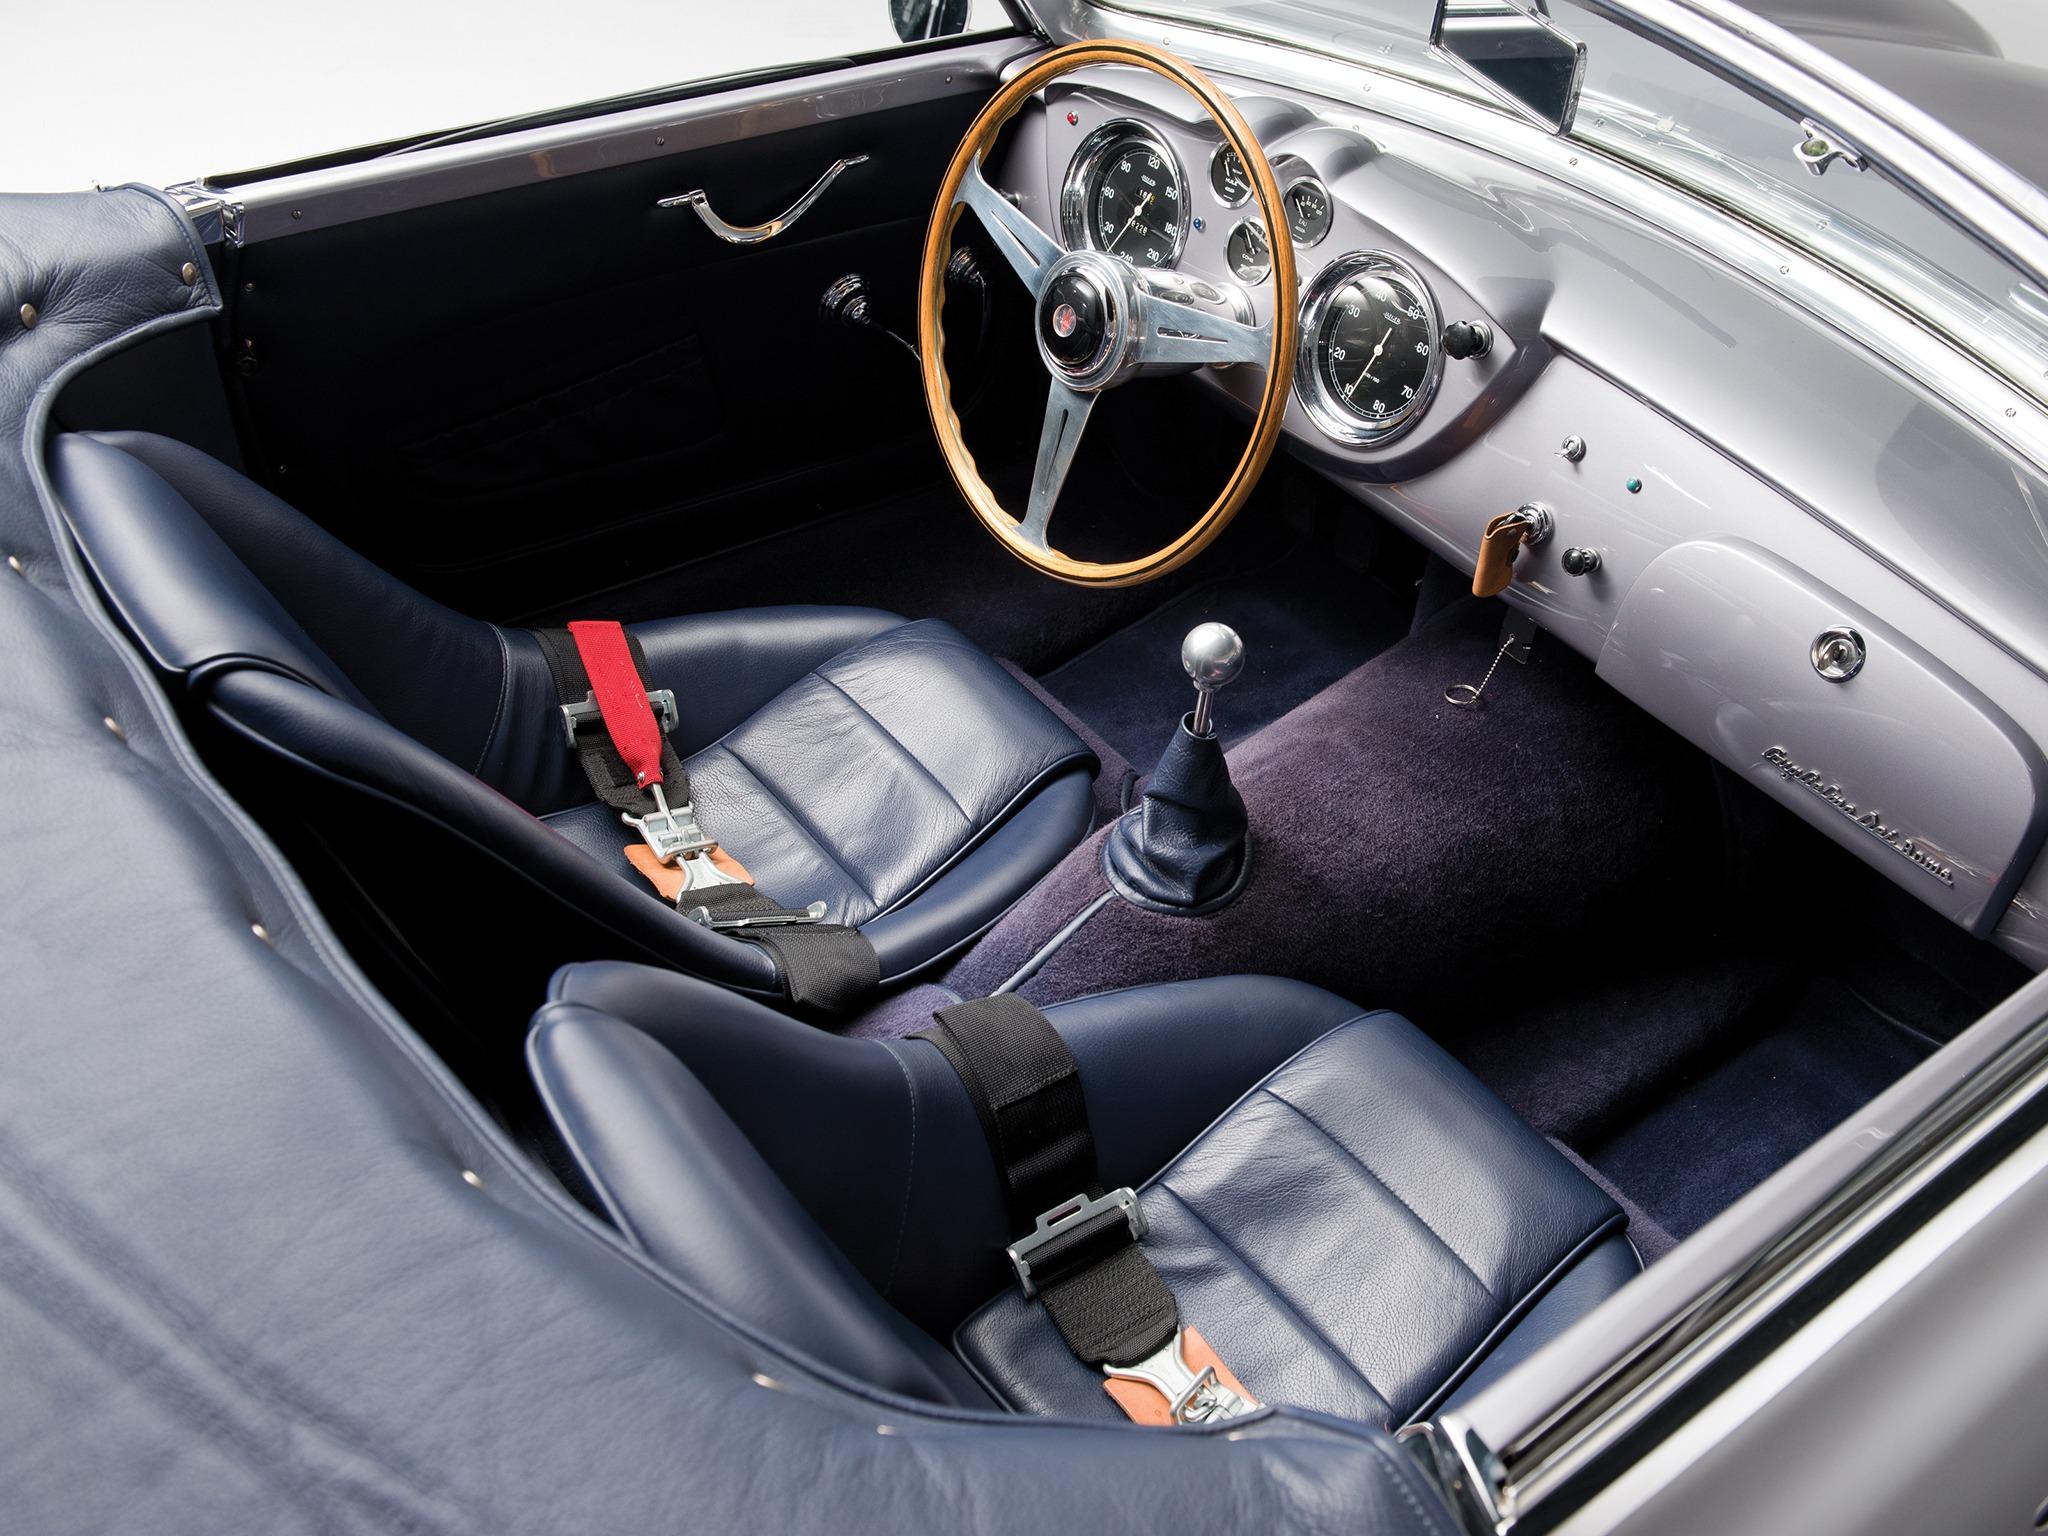 1956-Frua-Maserati-A6G-2000-Spyder-07